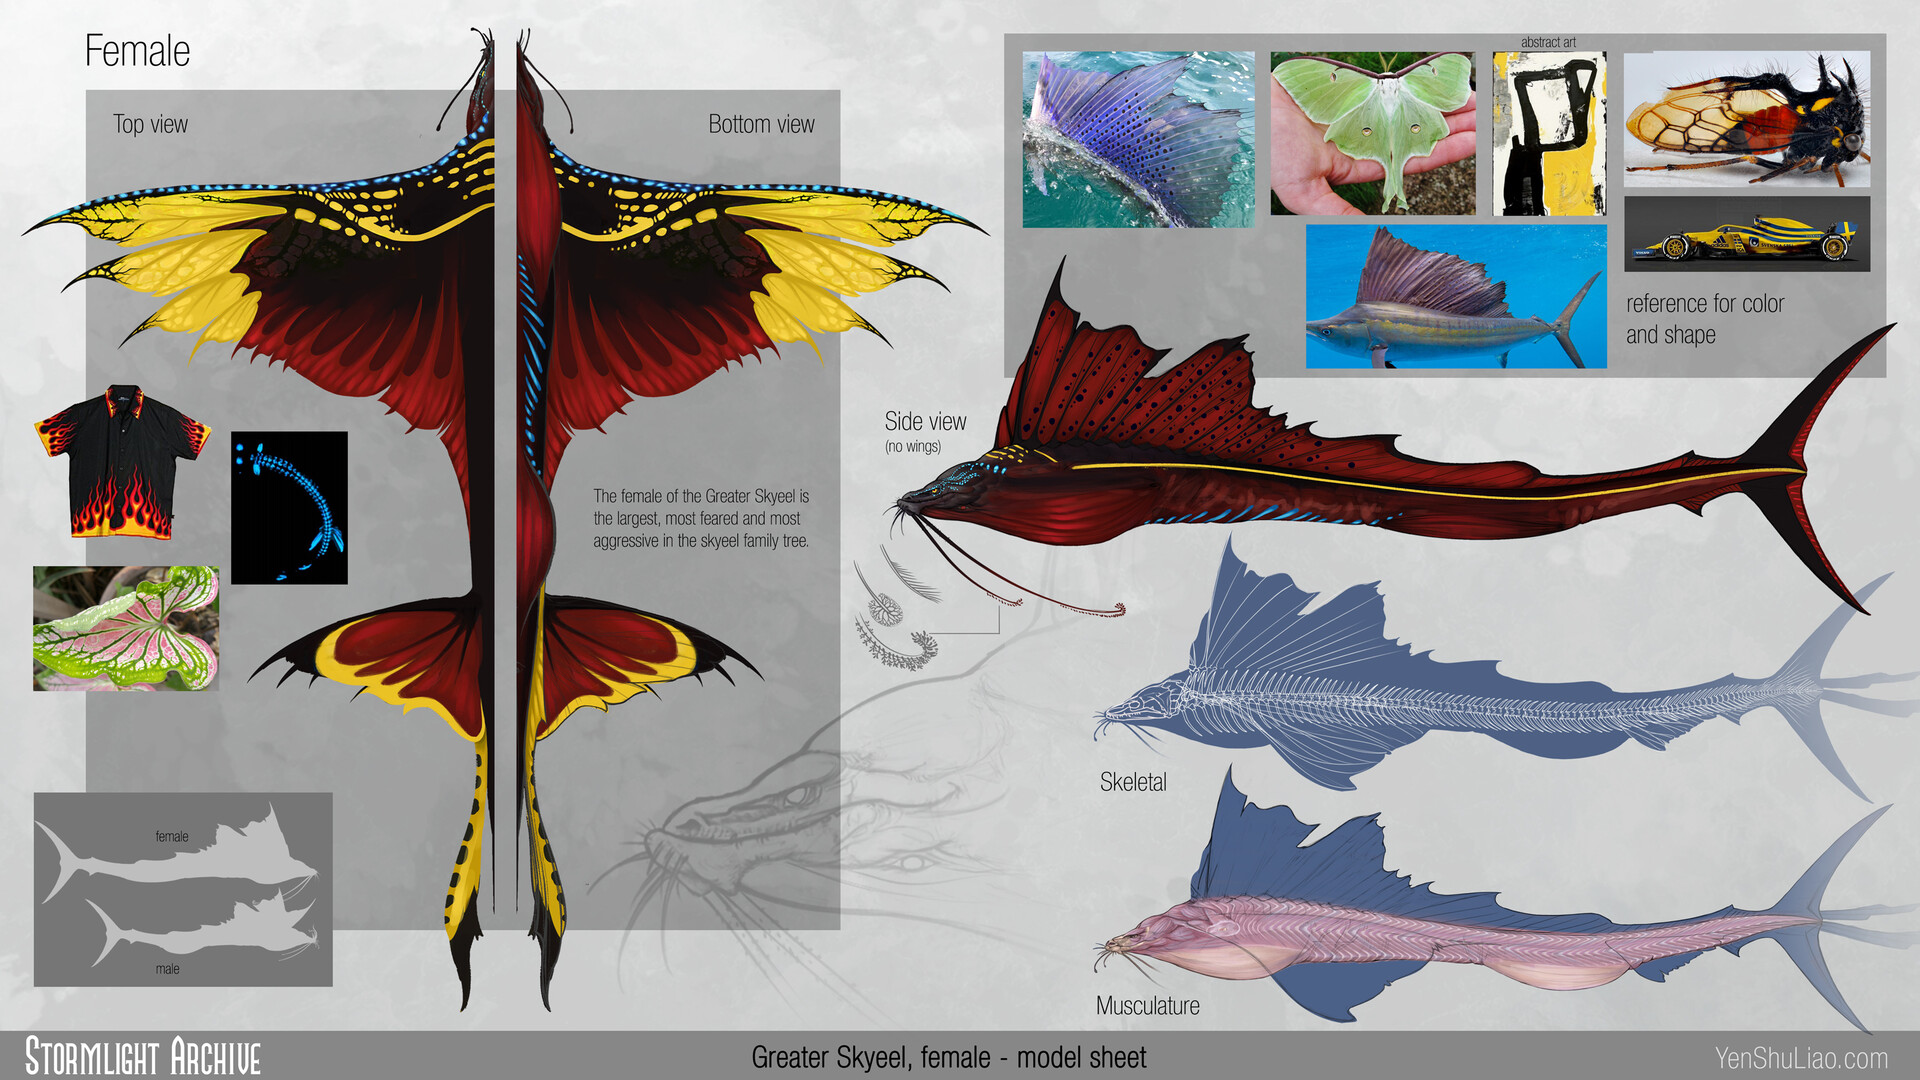 Yen shu liao stormlightarchive skyeel greater creature concept orthof yen shu liao